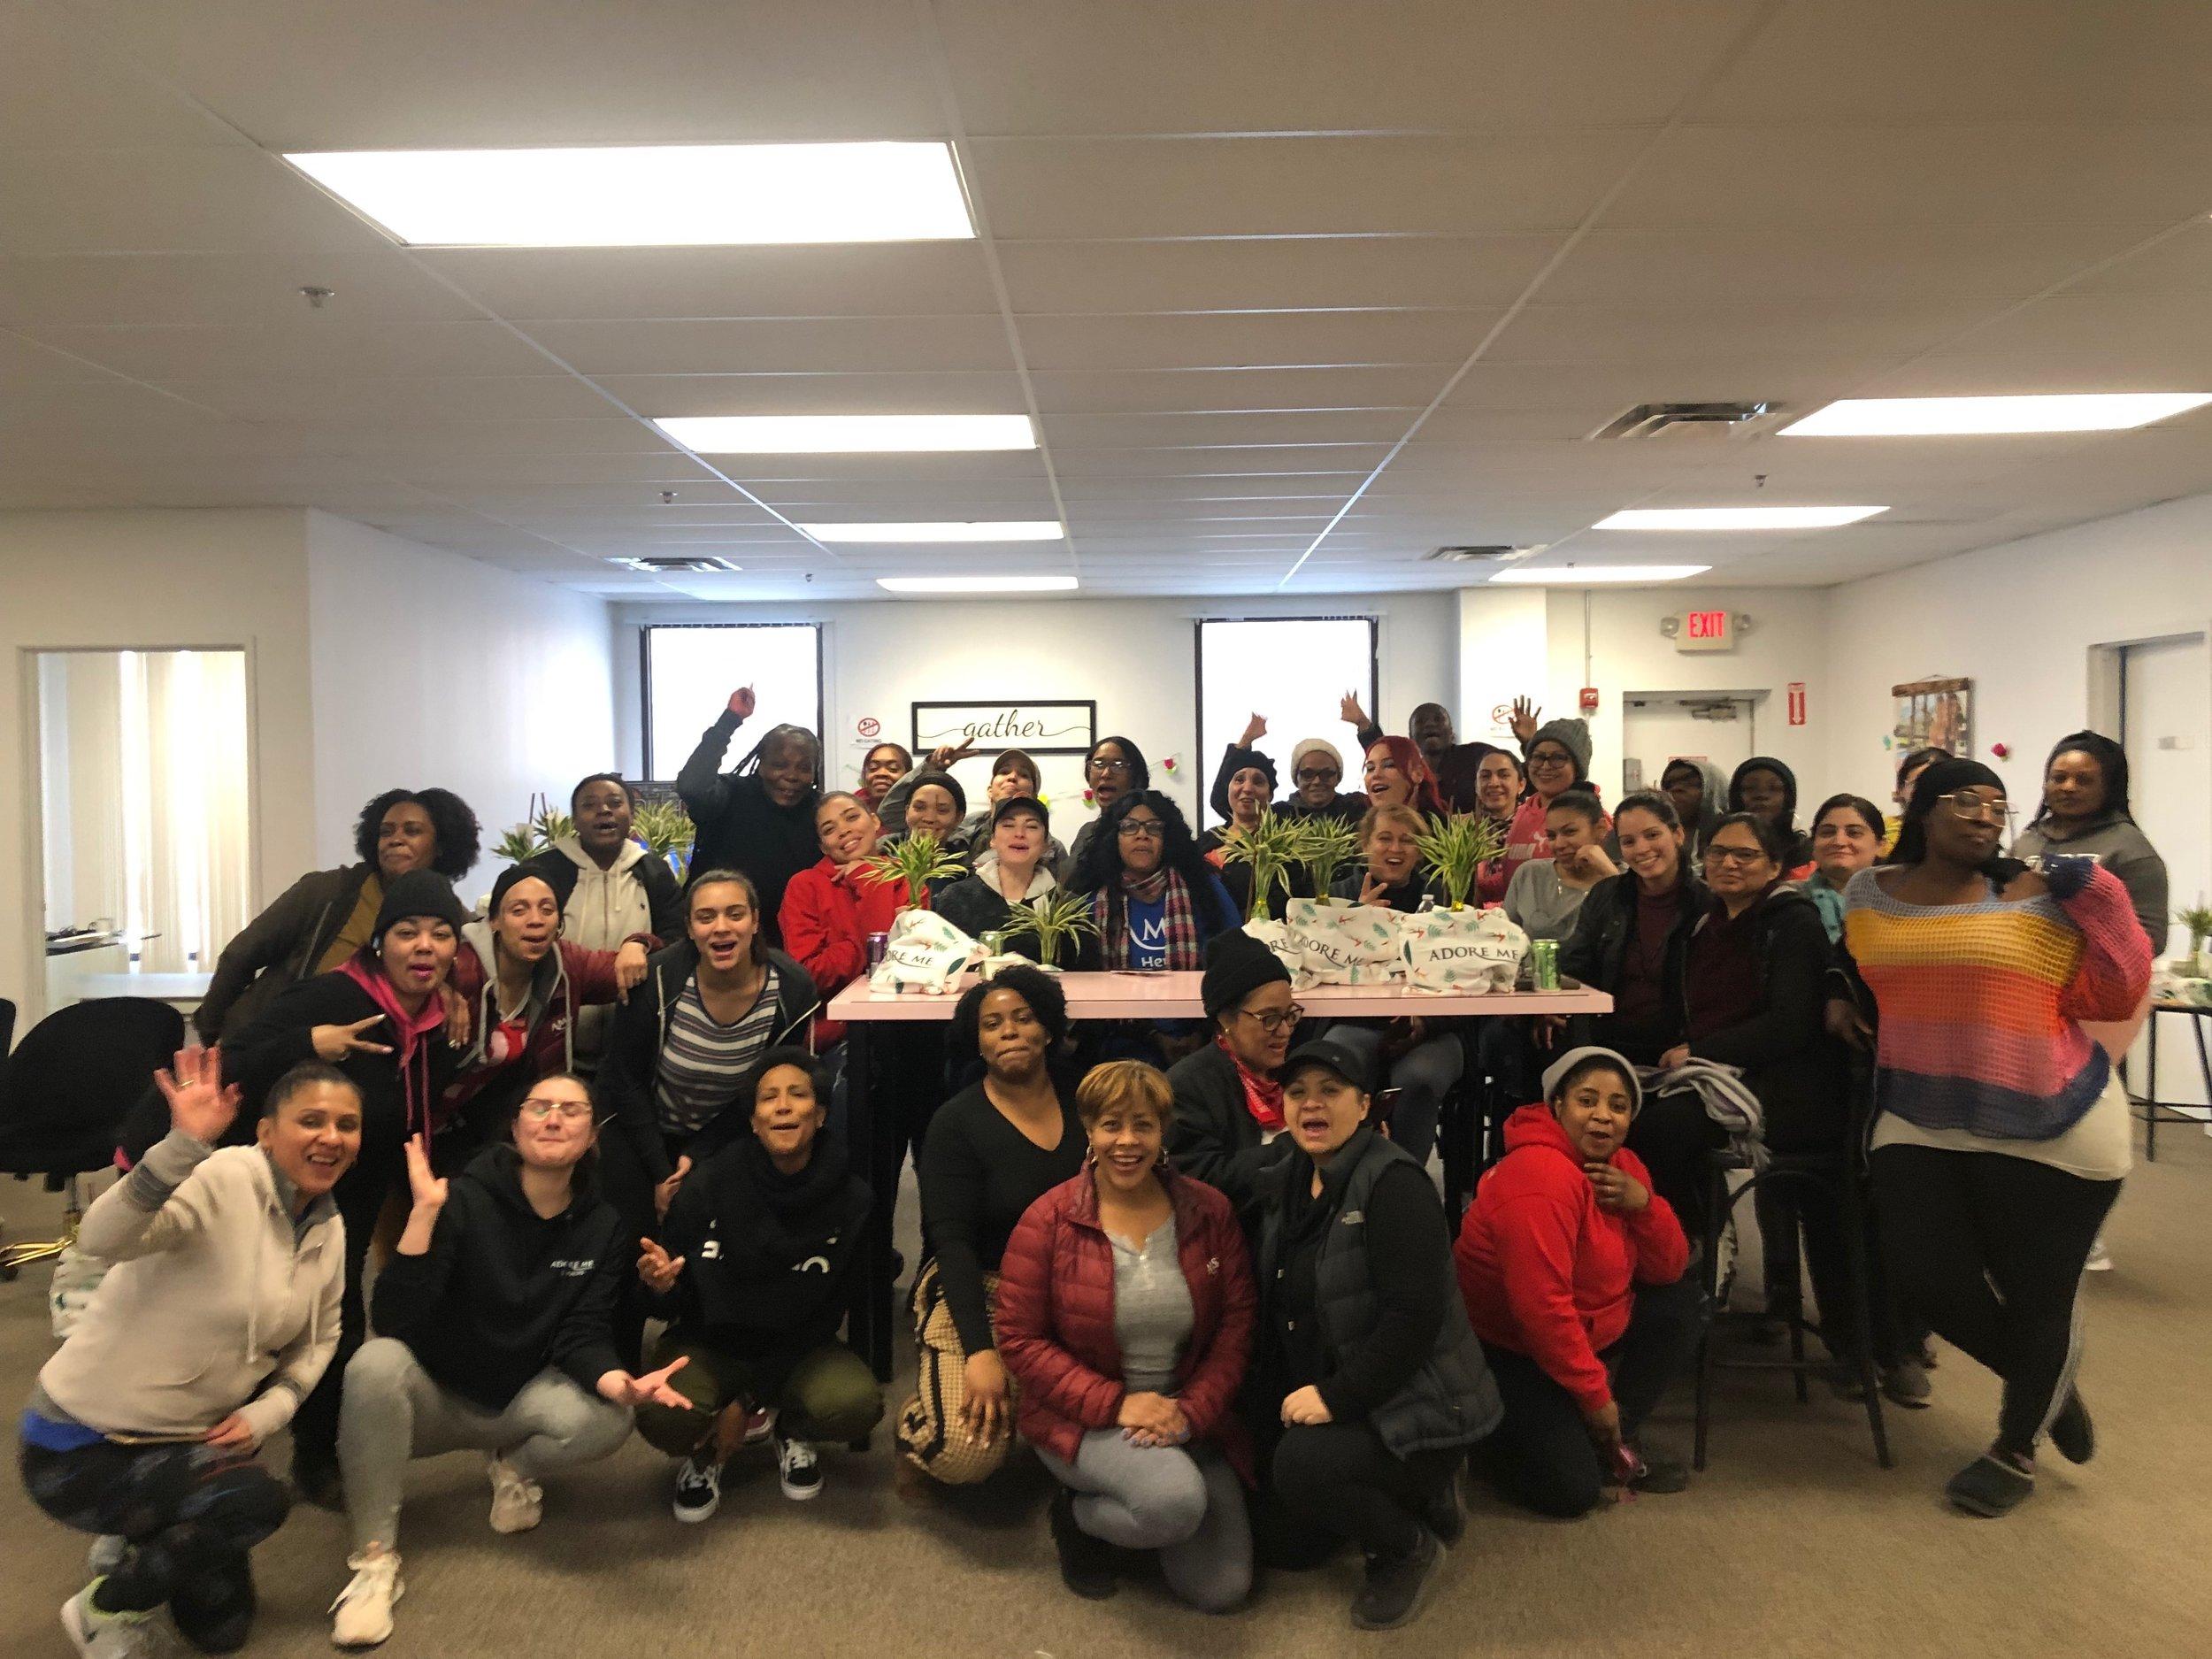 Women's day 19' at AMS.JPG